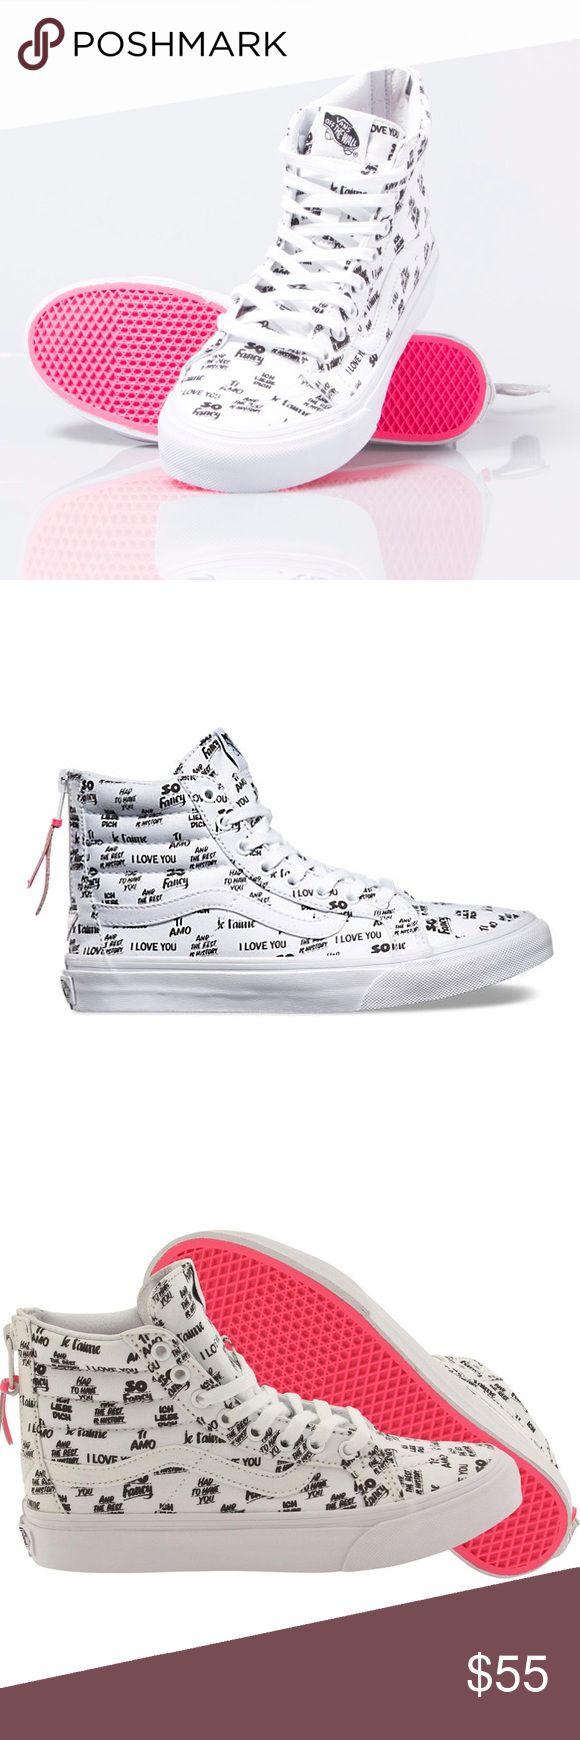 Vans Baron Von Fancy Sk8-Hi Slim Zip Collaboration The shoe pictured is the exact pair for sale. Vans Shoes Sneakers